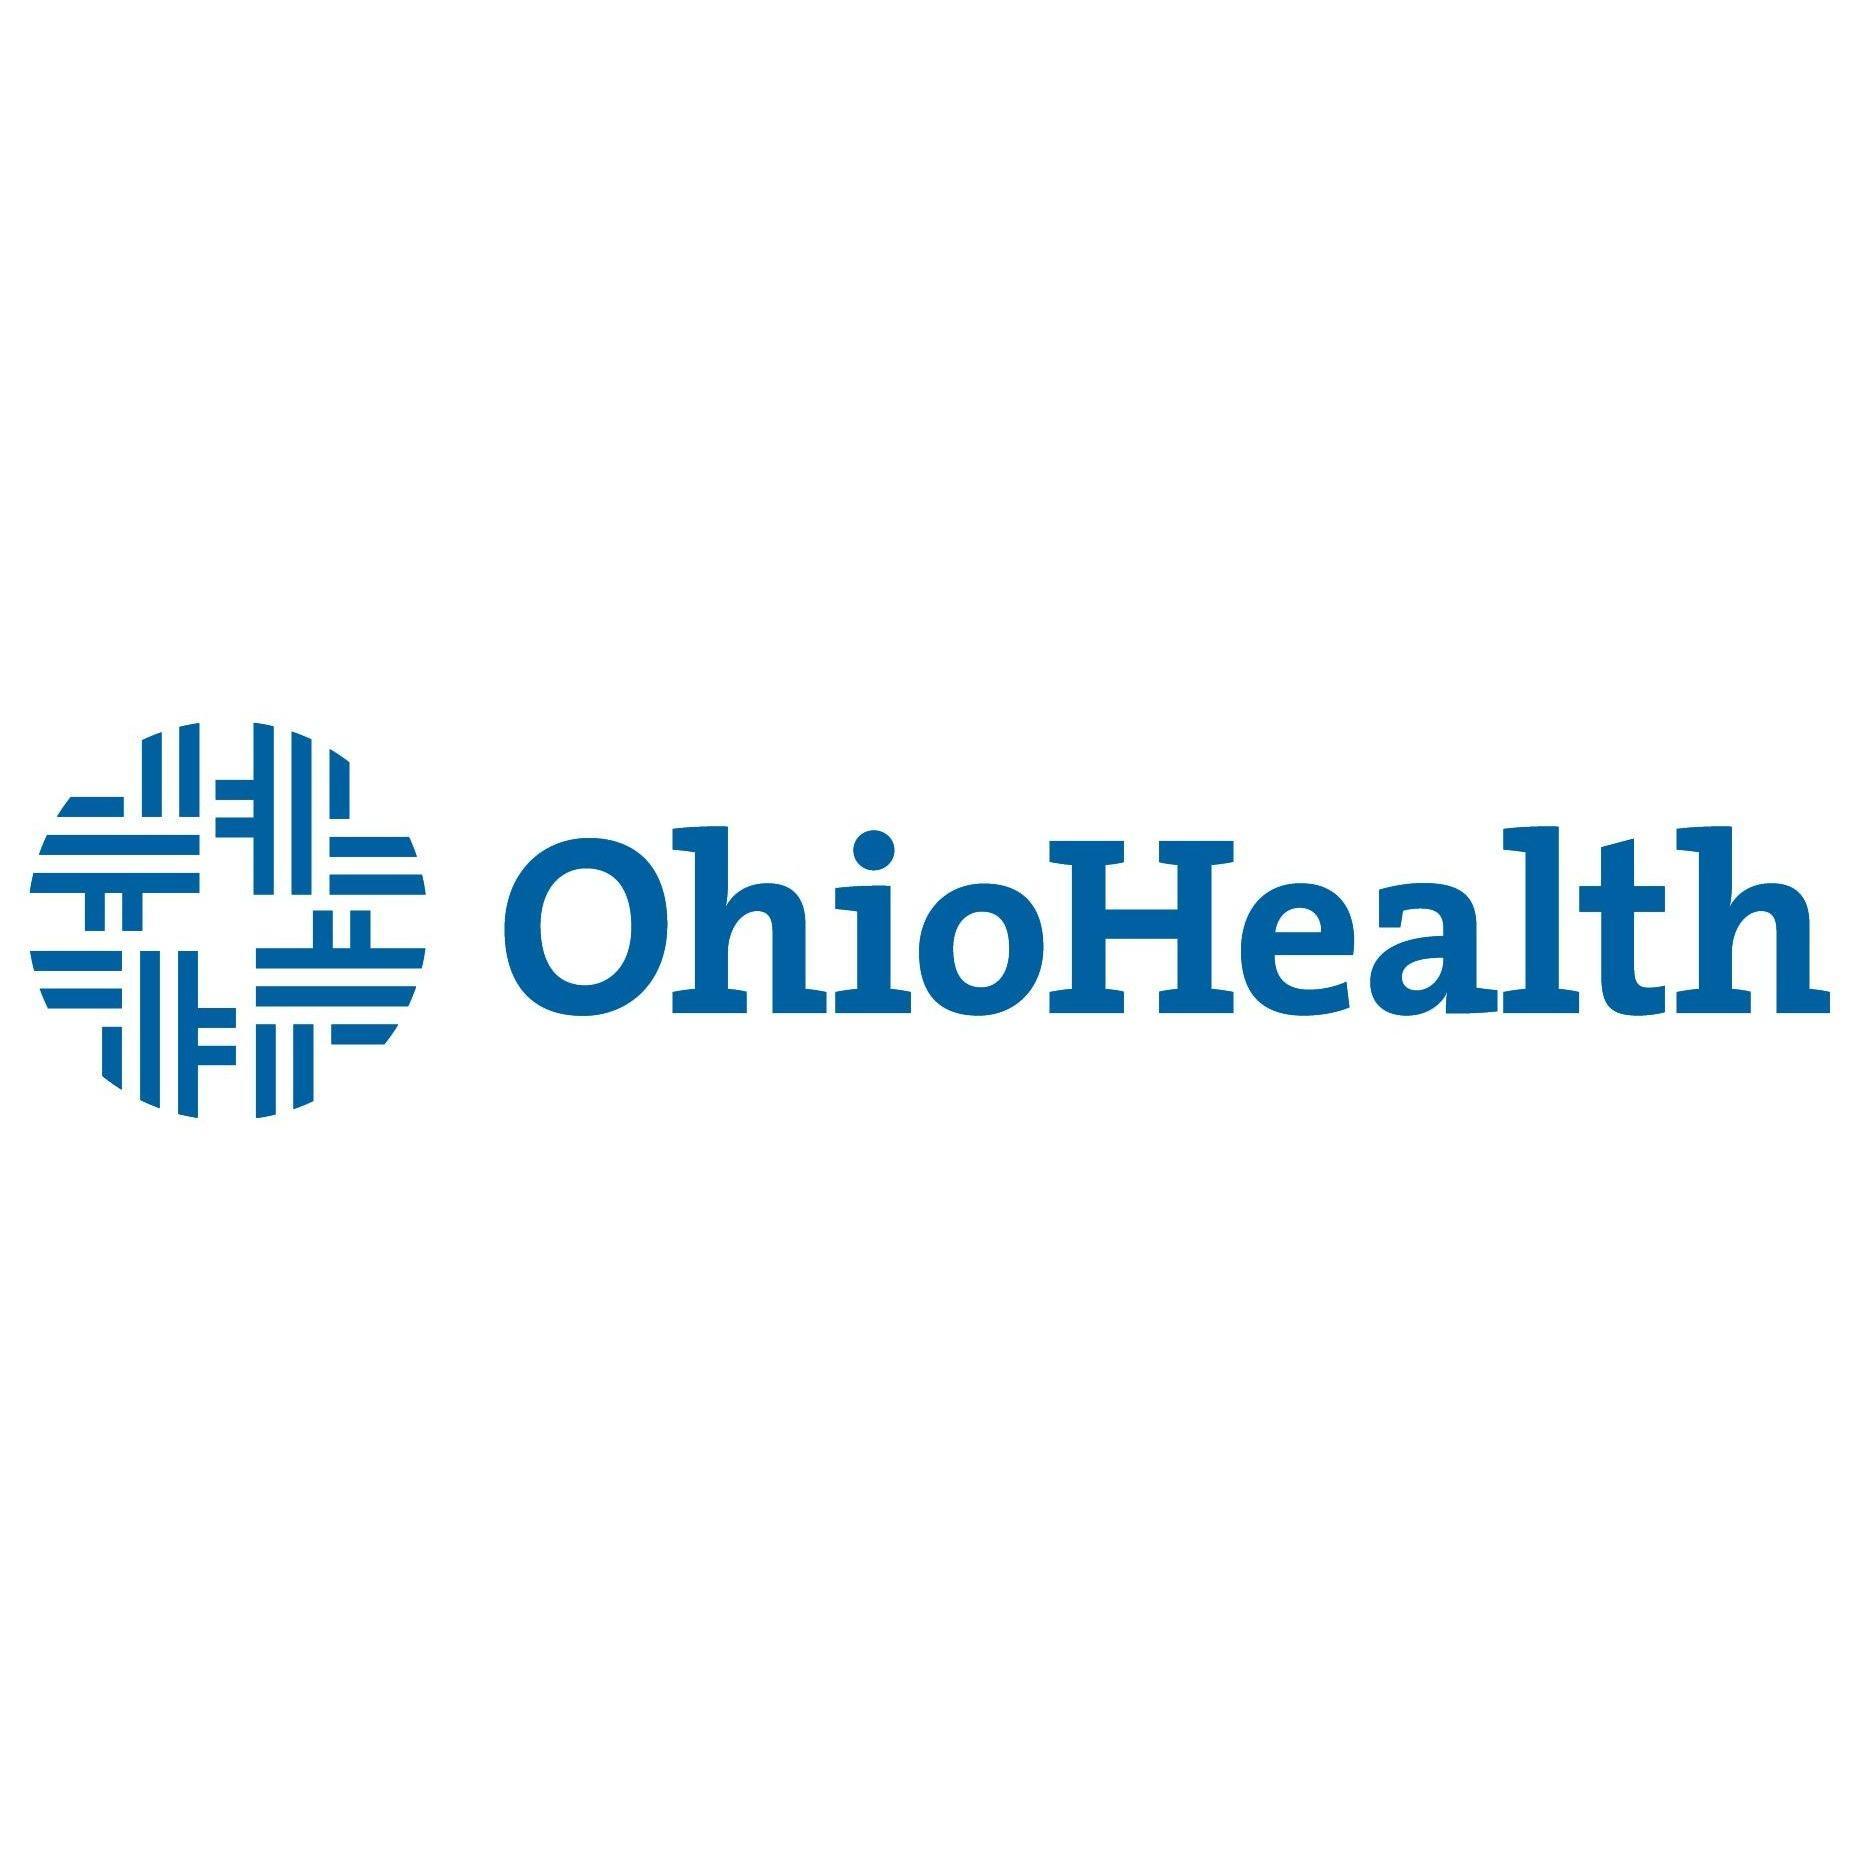 OhioHealth Emergency Care Center image 1